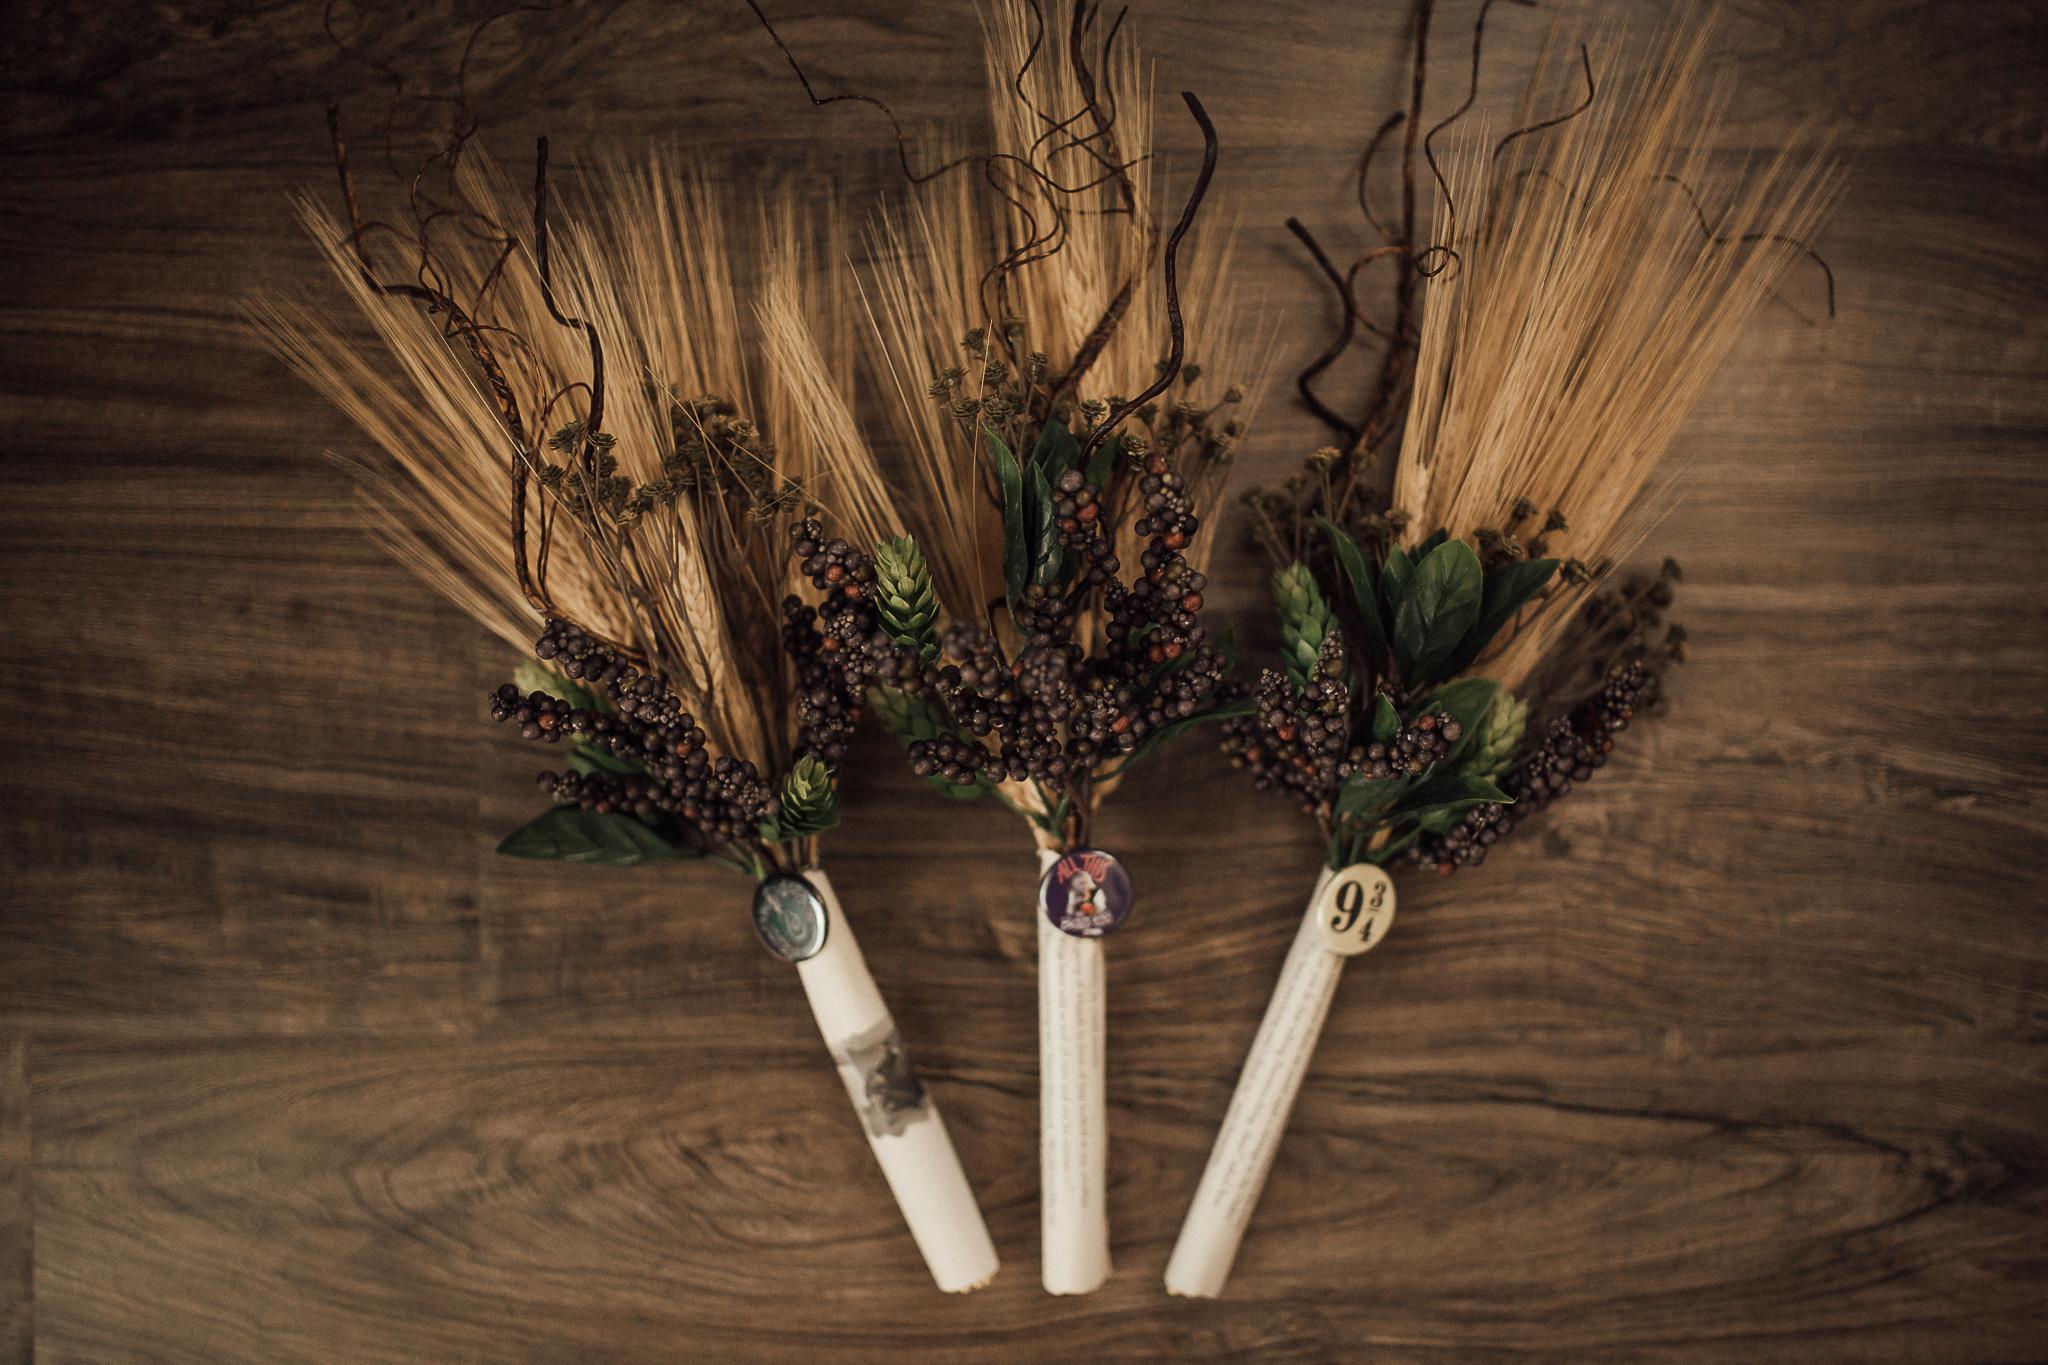 cassie-cook-photography-memphis-made-memphis-wedding-venue-memphis-wedding-photographer-robbie-casey